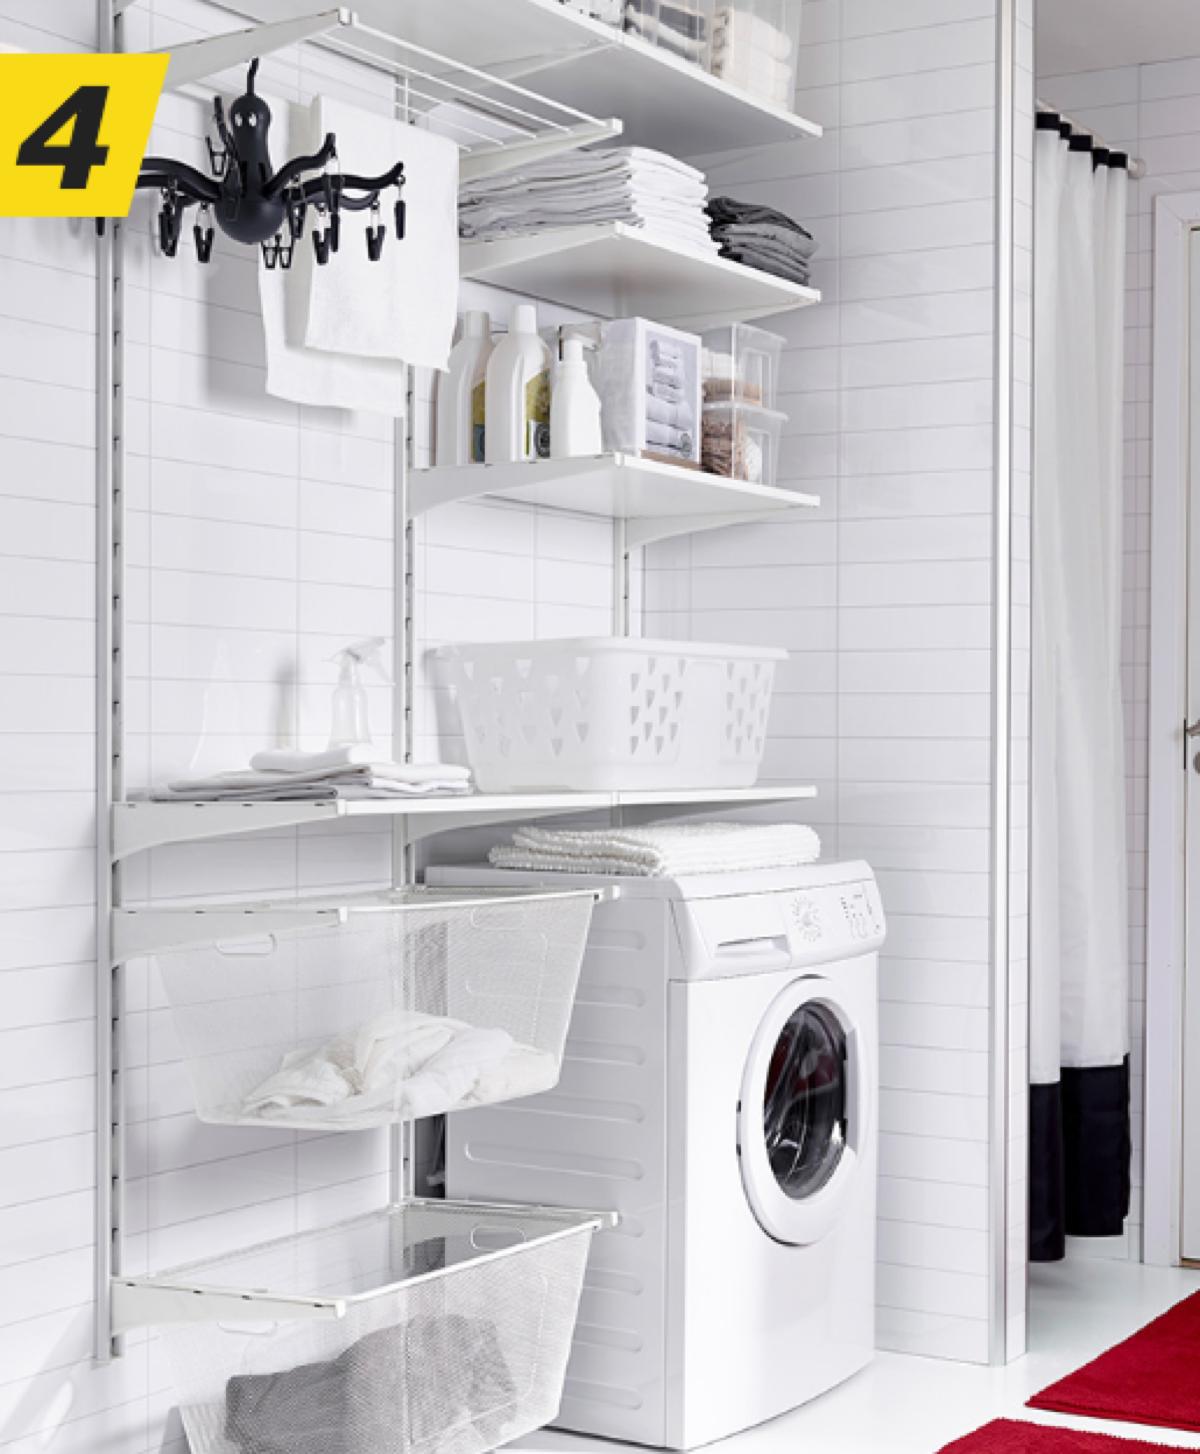 zona de plancha Ikea